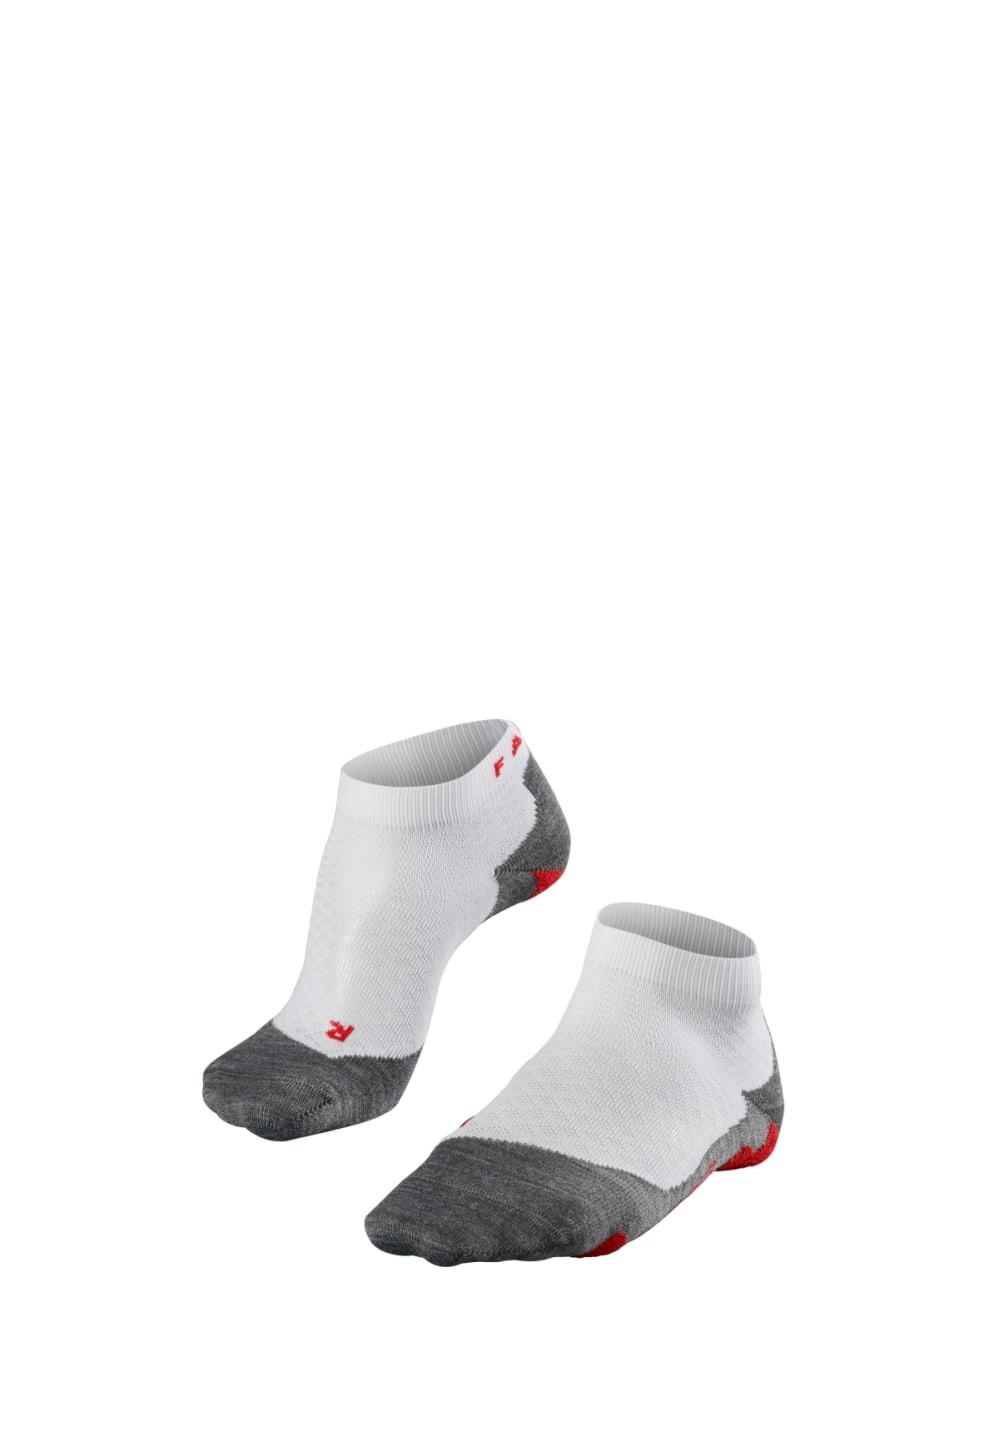 Falke RU 5 Short - Laufsocken für Damen - Grau